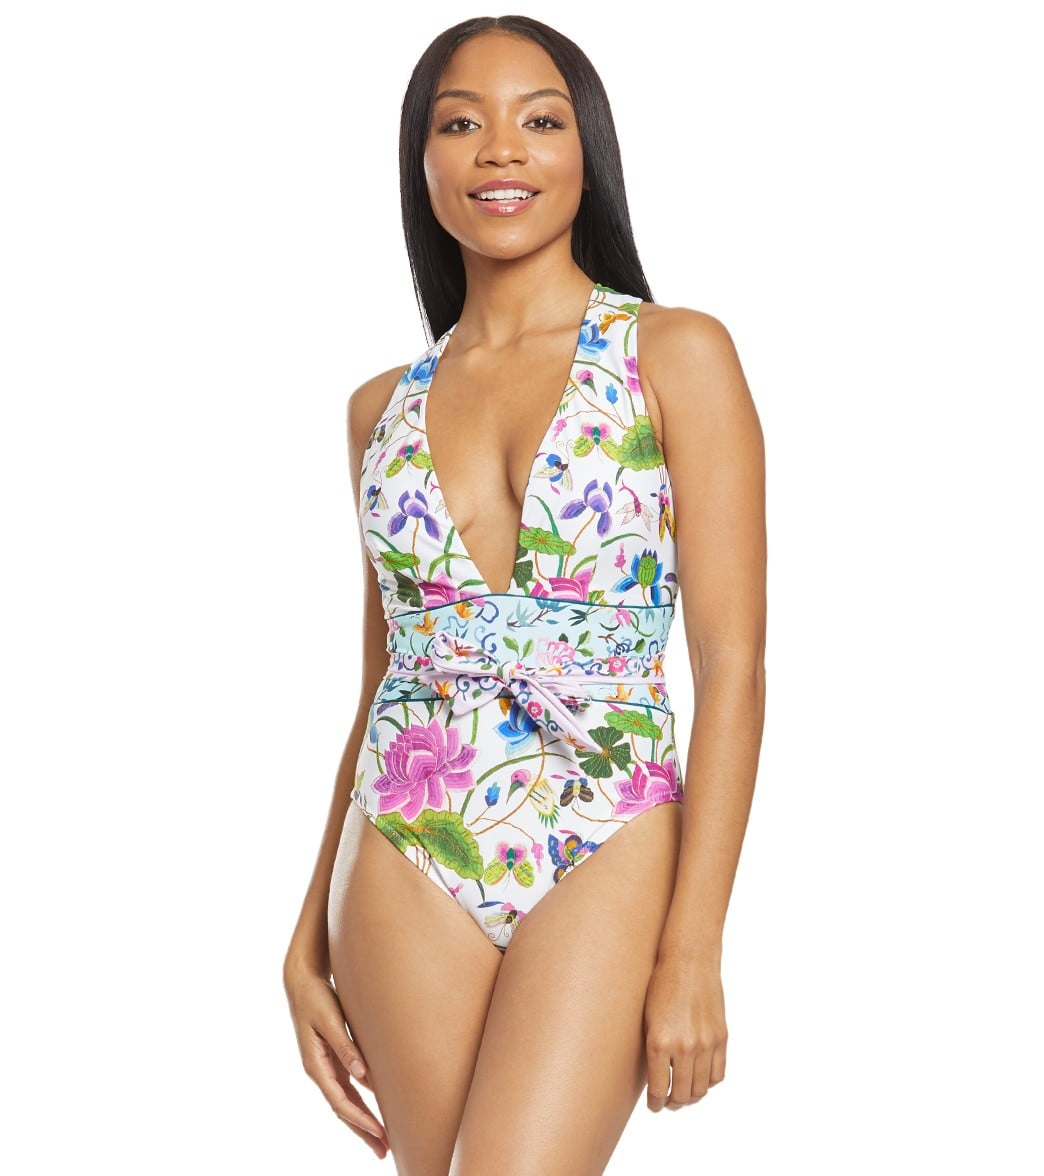 2194ec1eb1b Nanette Lepore Opulent Garden Belle Plunge One Piece Swimsuit at  SwimOutlet.com - Free Shipping